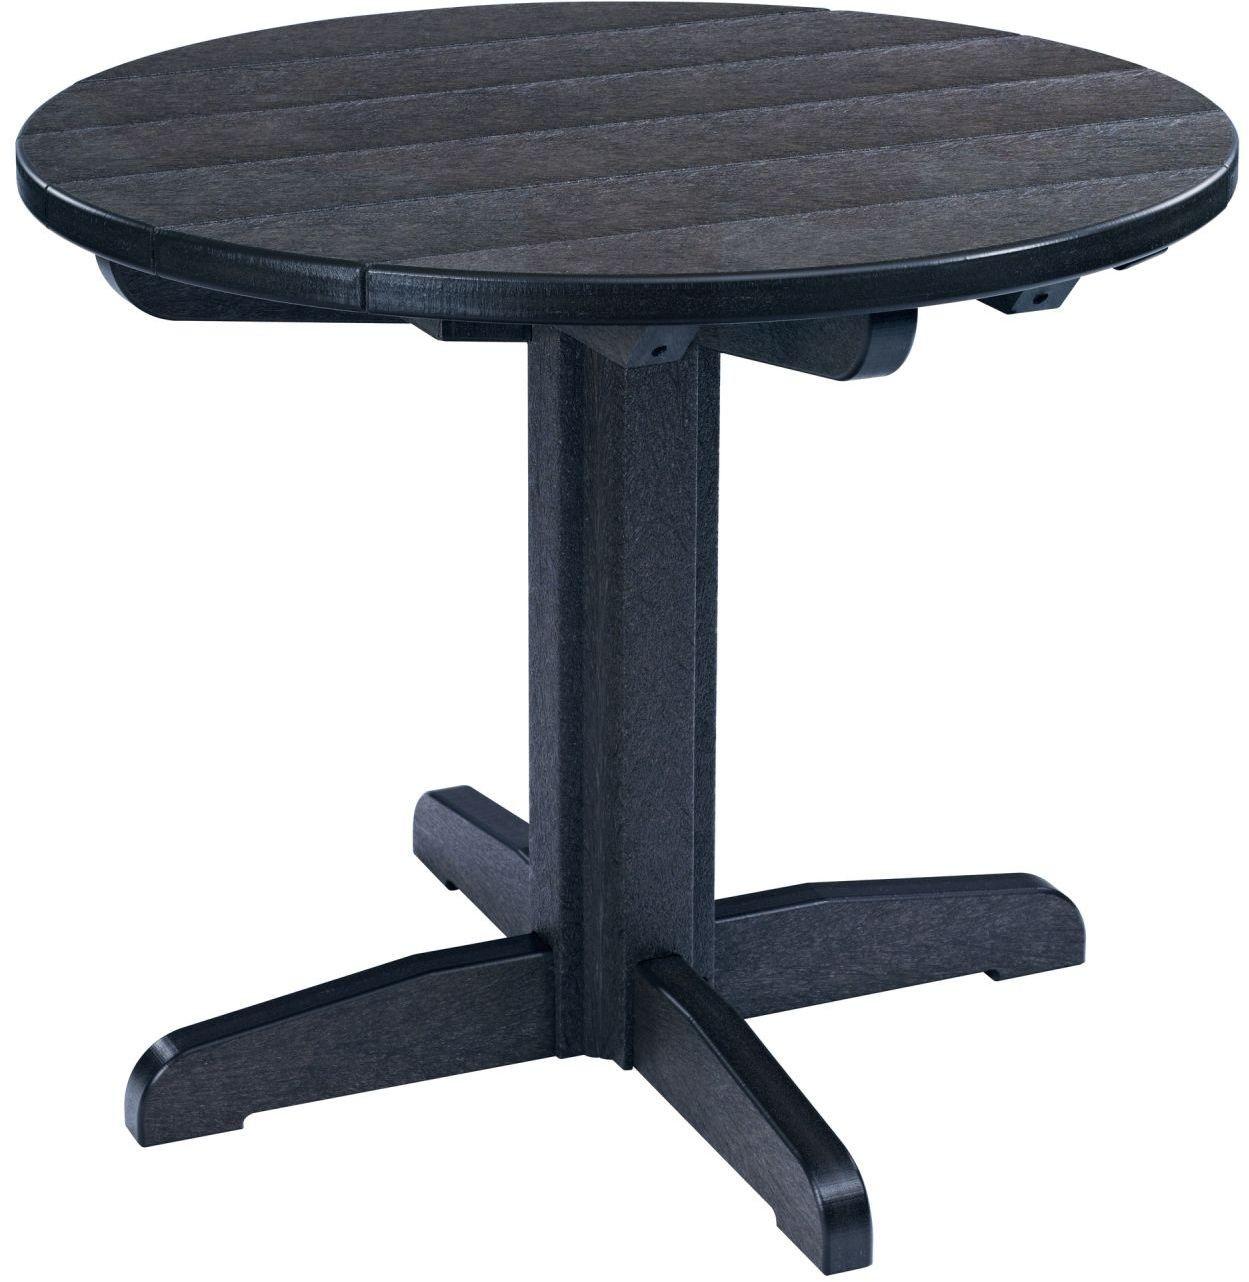 Generations Black 32 Round Pedestal Dining Table TT01